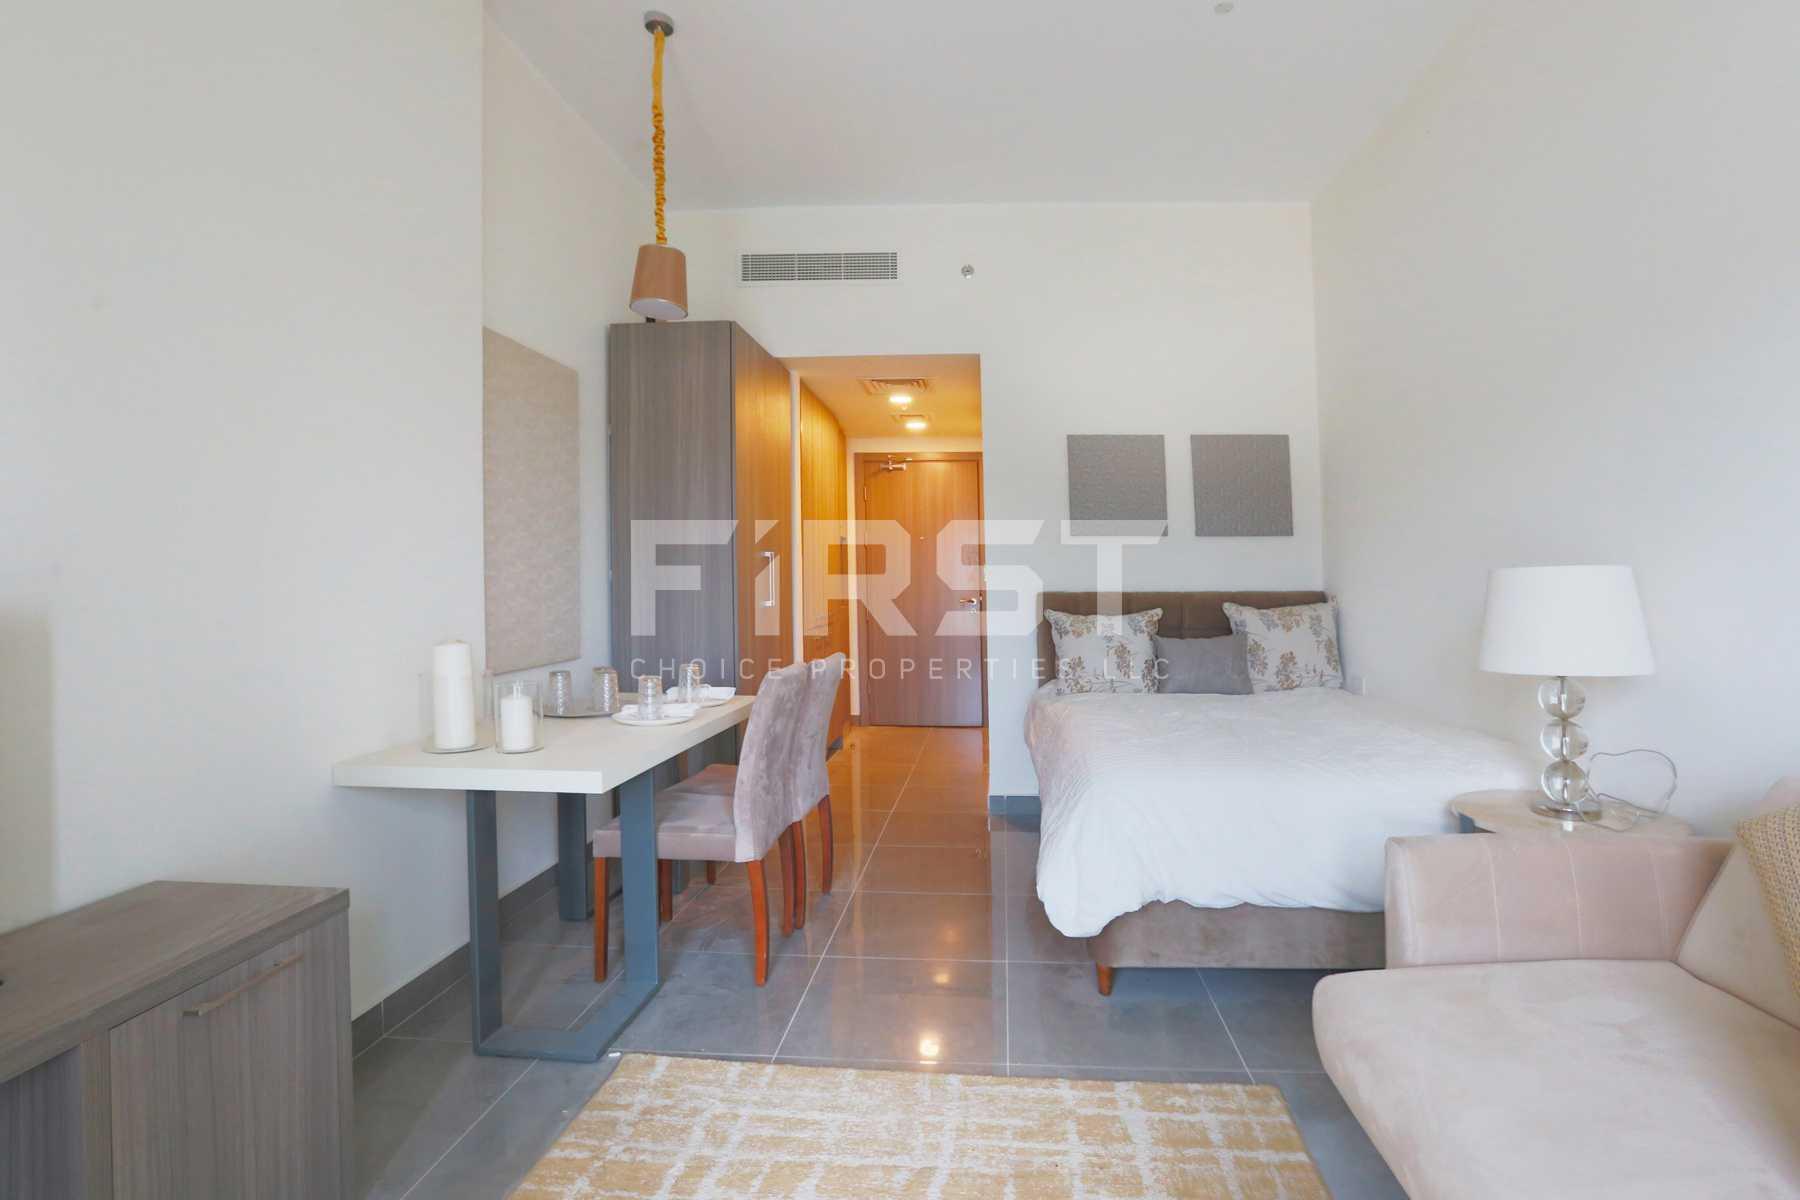 Internal Photo of Studio Apartment in Leonardo Residences Masdar City Abu Dhabi UAE (1).jpg